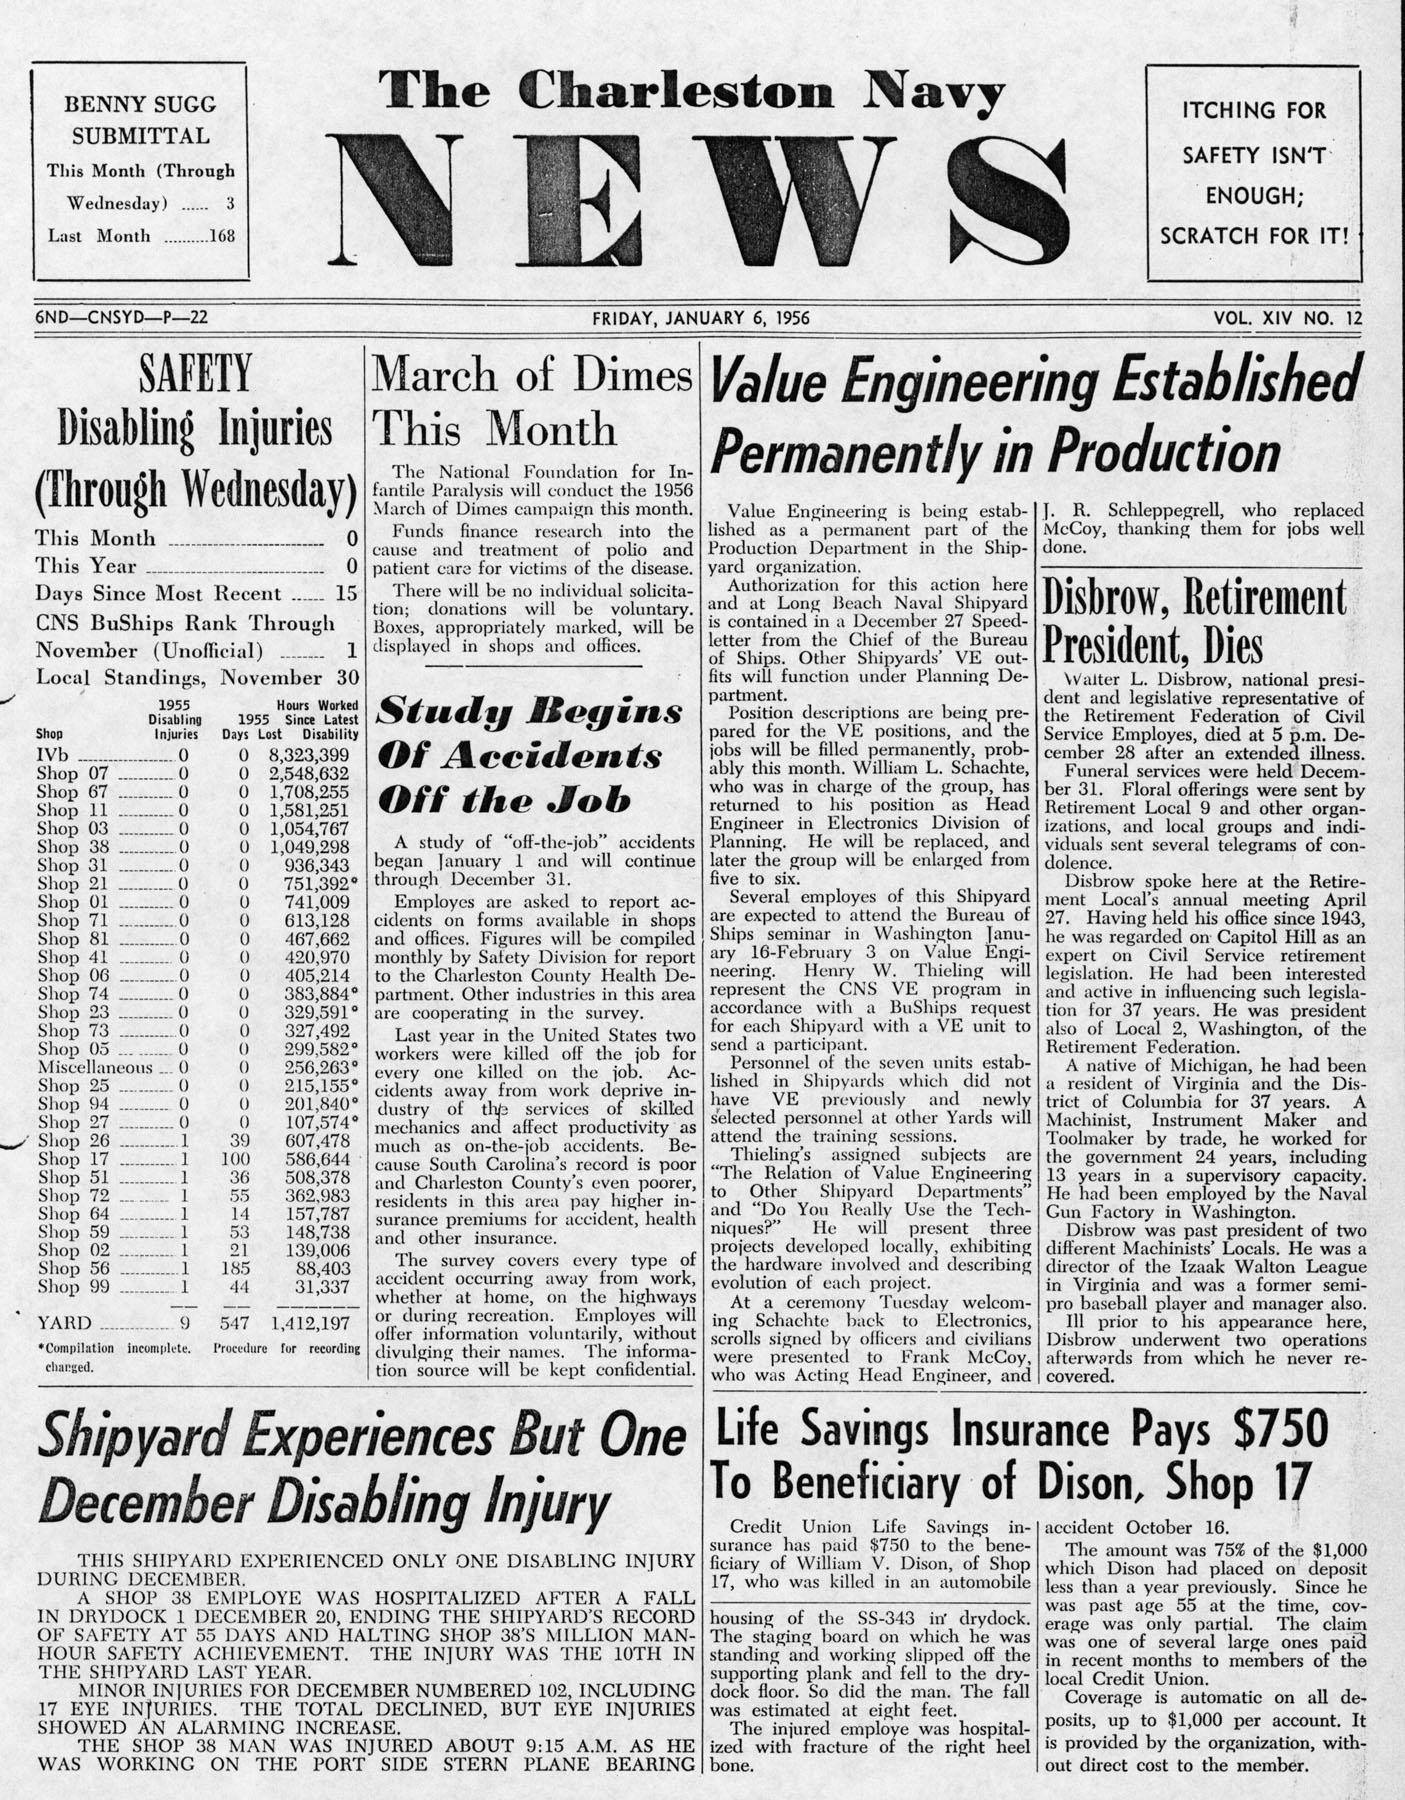 The Charleston Navy News, Volume 14, Edition 12, page i